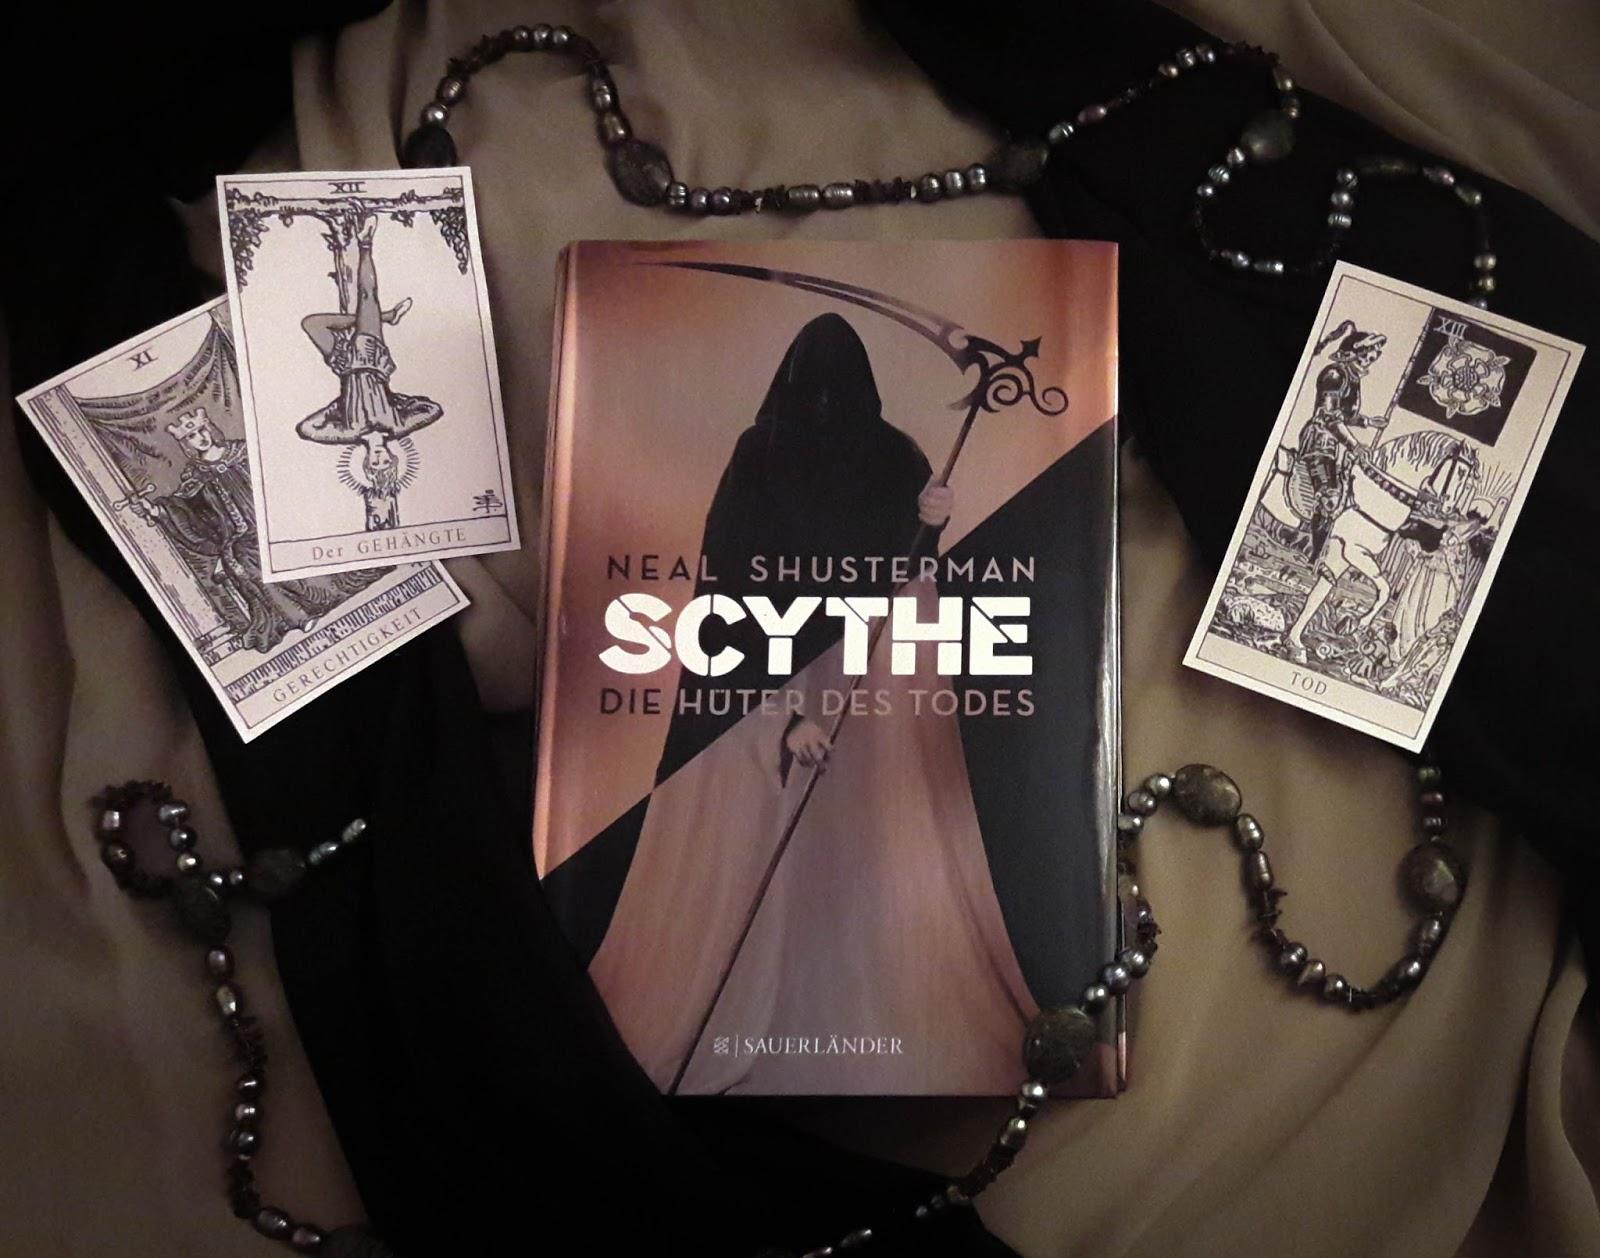 Scythe: Die Hüter des Todes – Neal Shusterman graphic